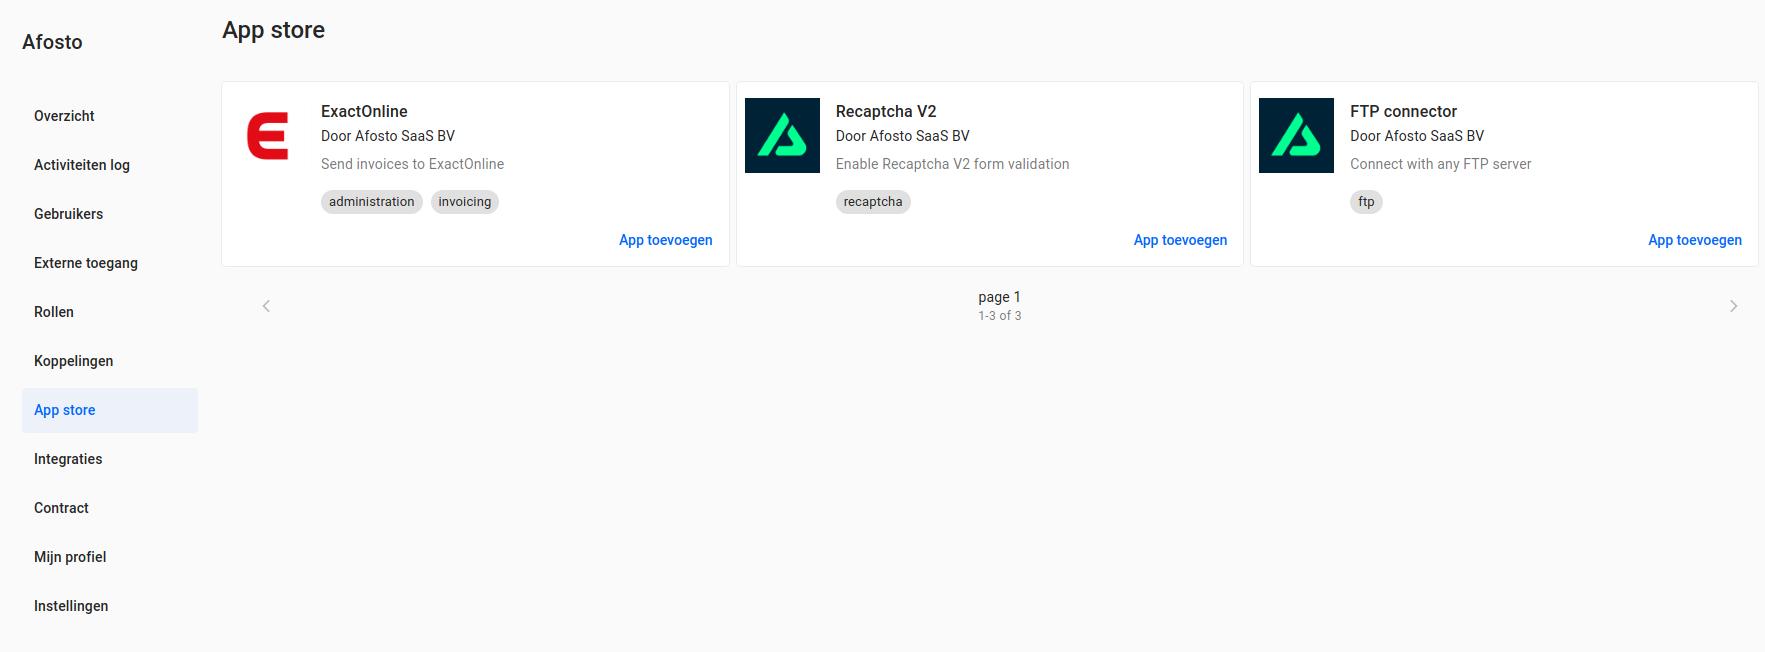 afosto-app-store.png